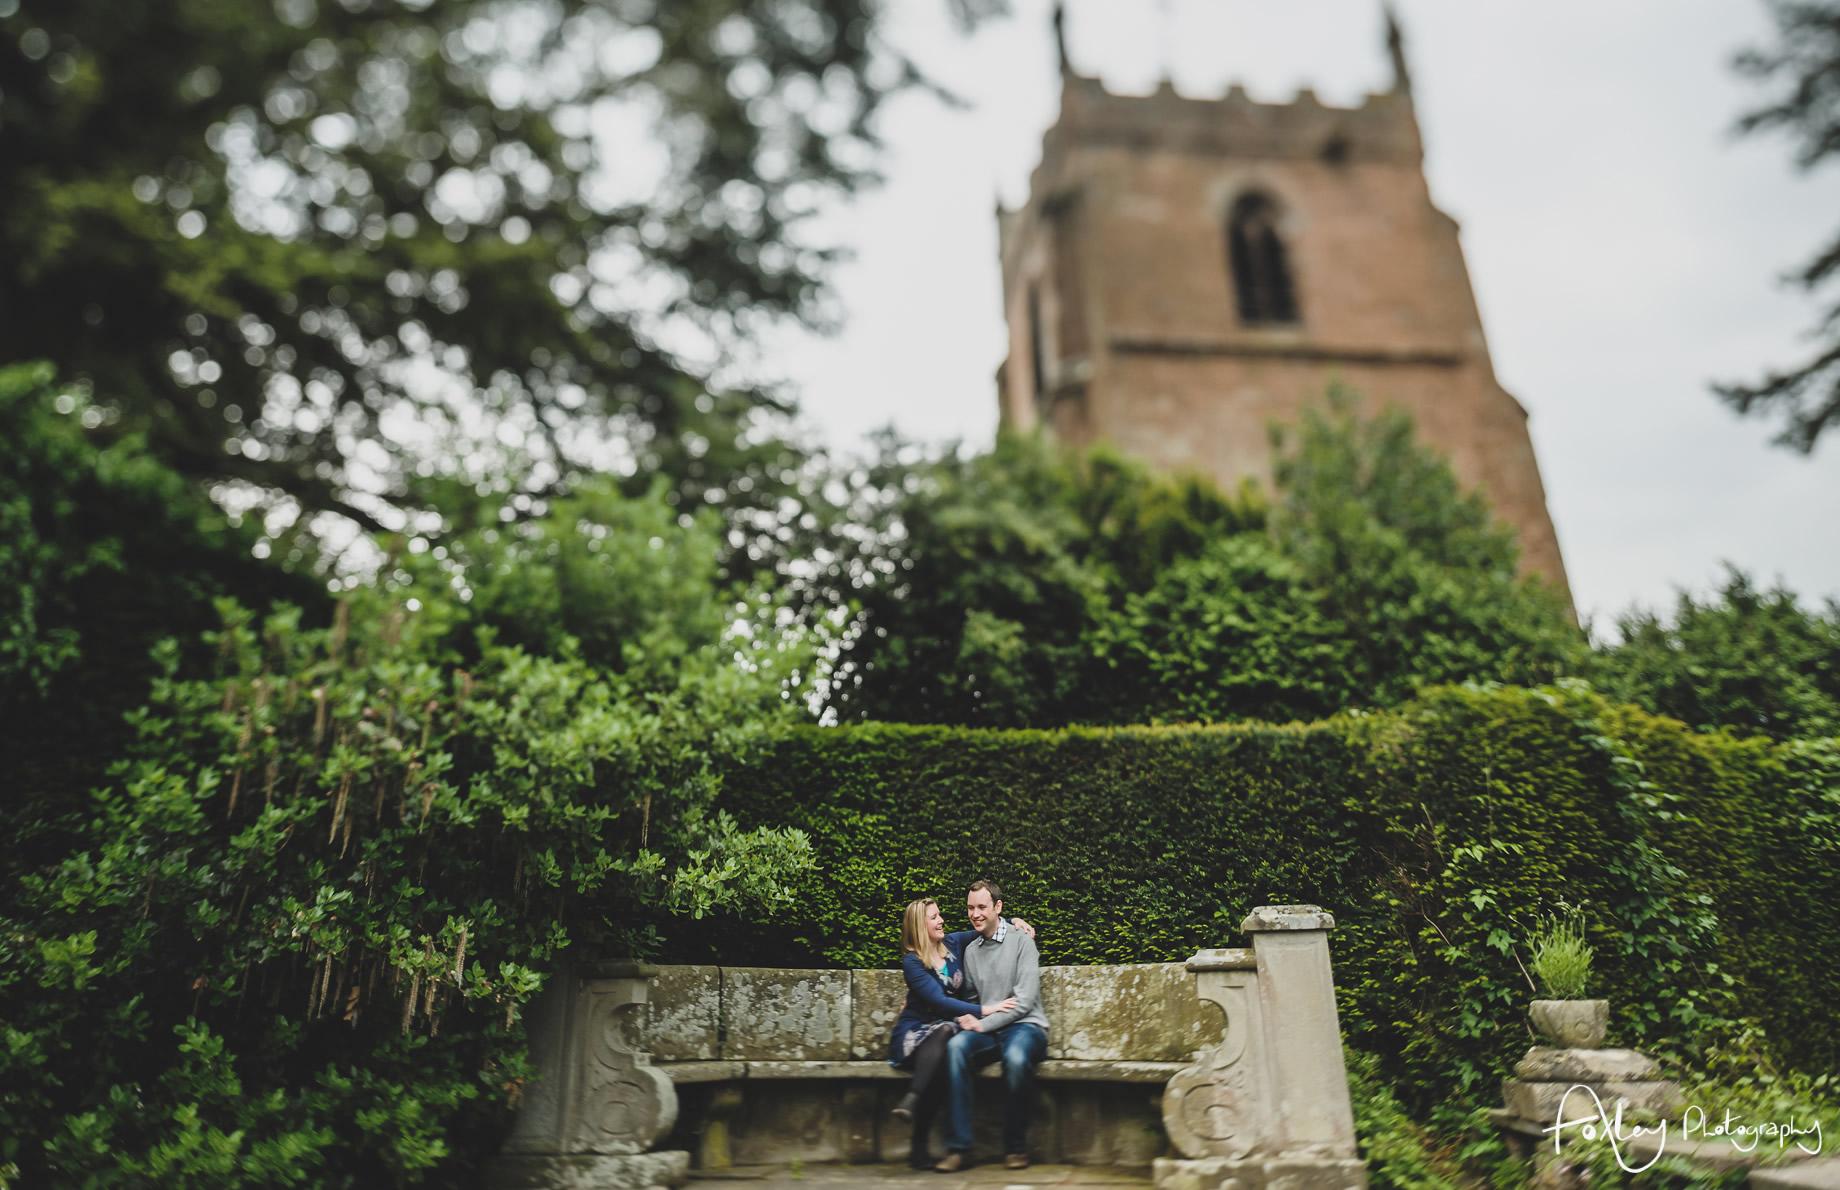 Rachel-and-Steve-Pre-Wedding-Shoot-at-The-How-Caple-Court-001